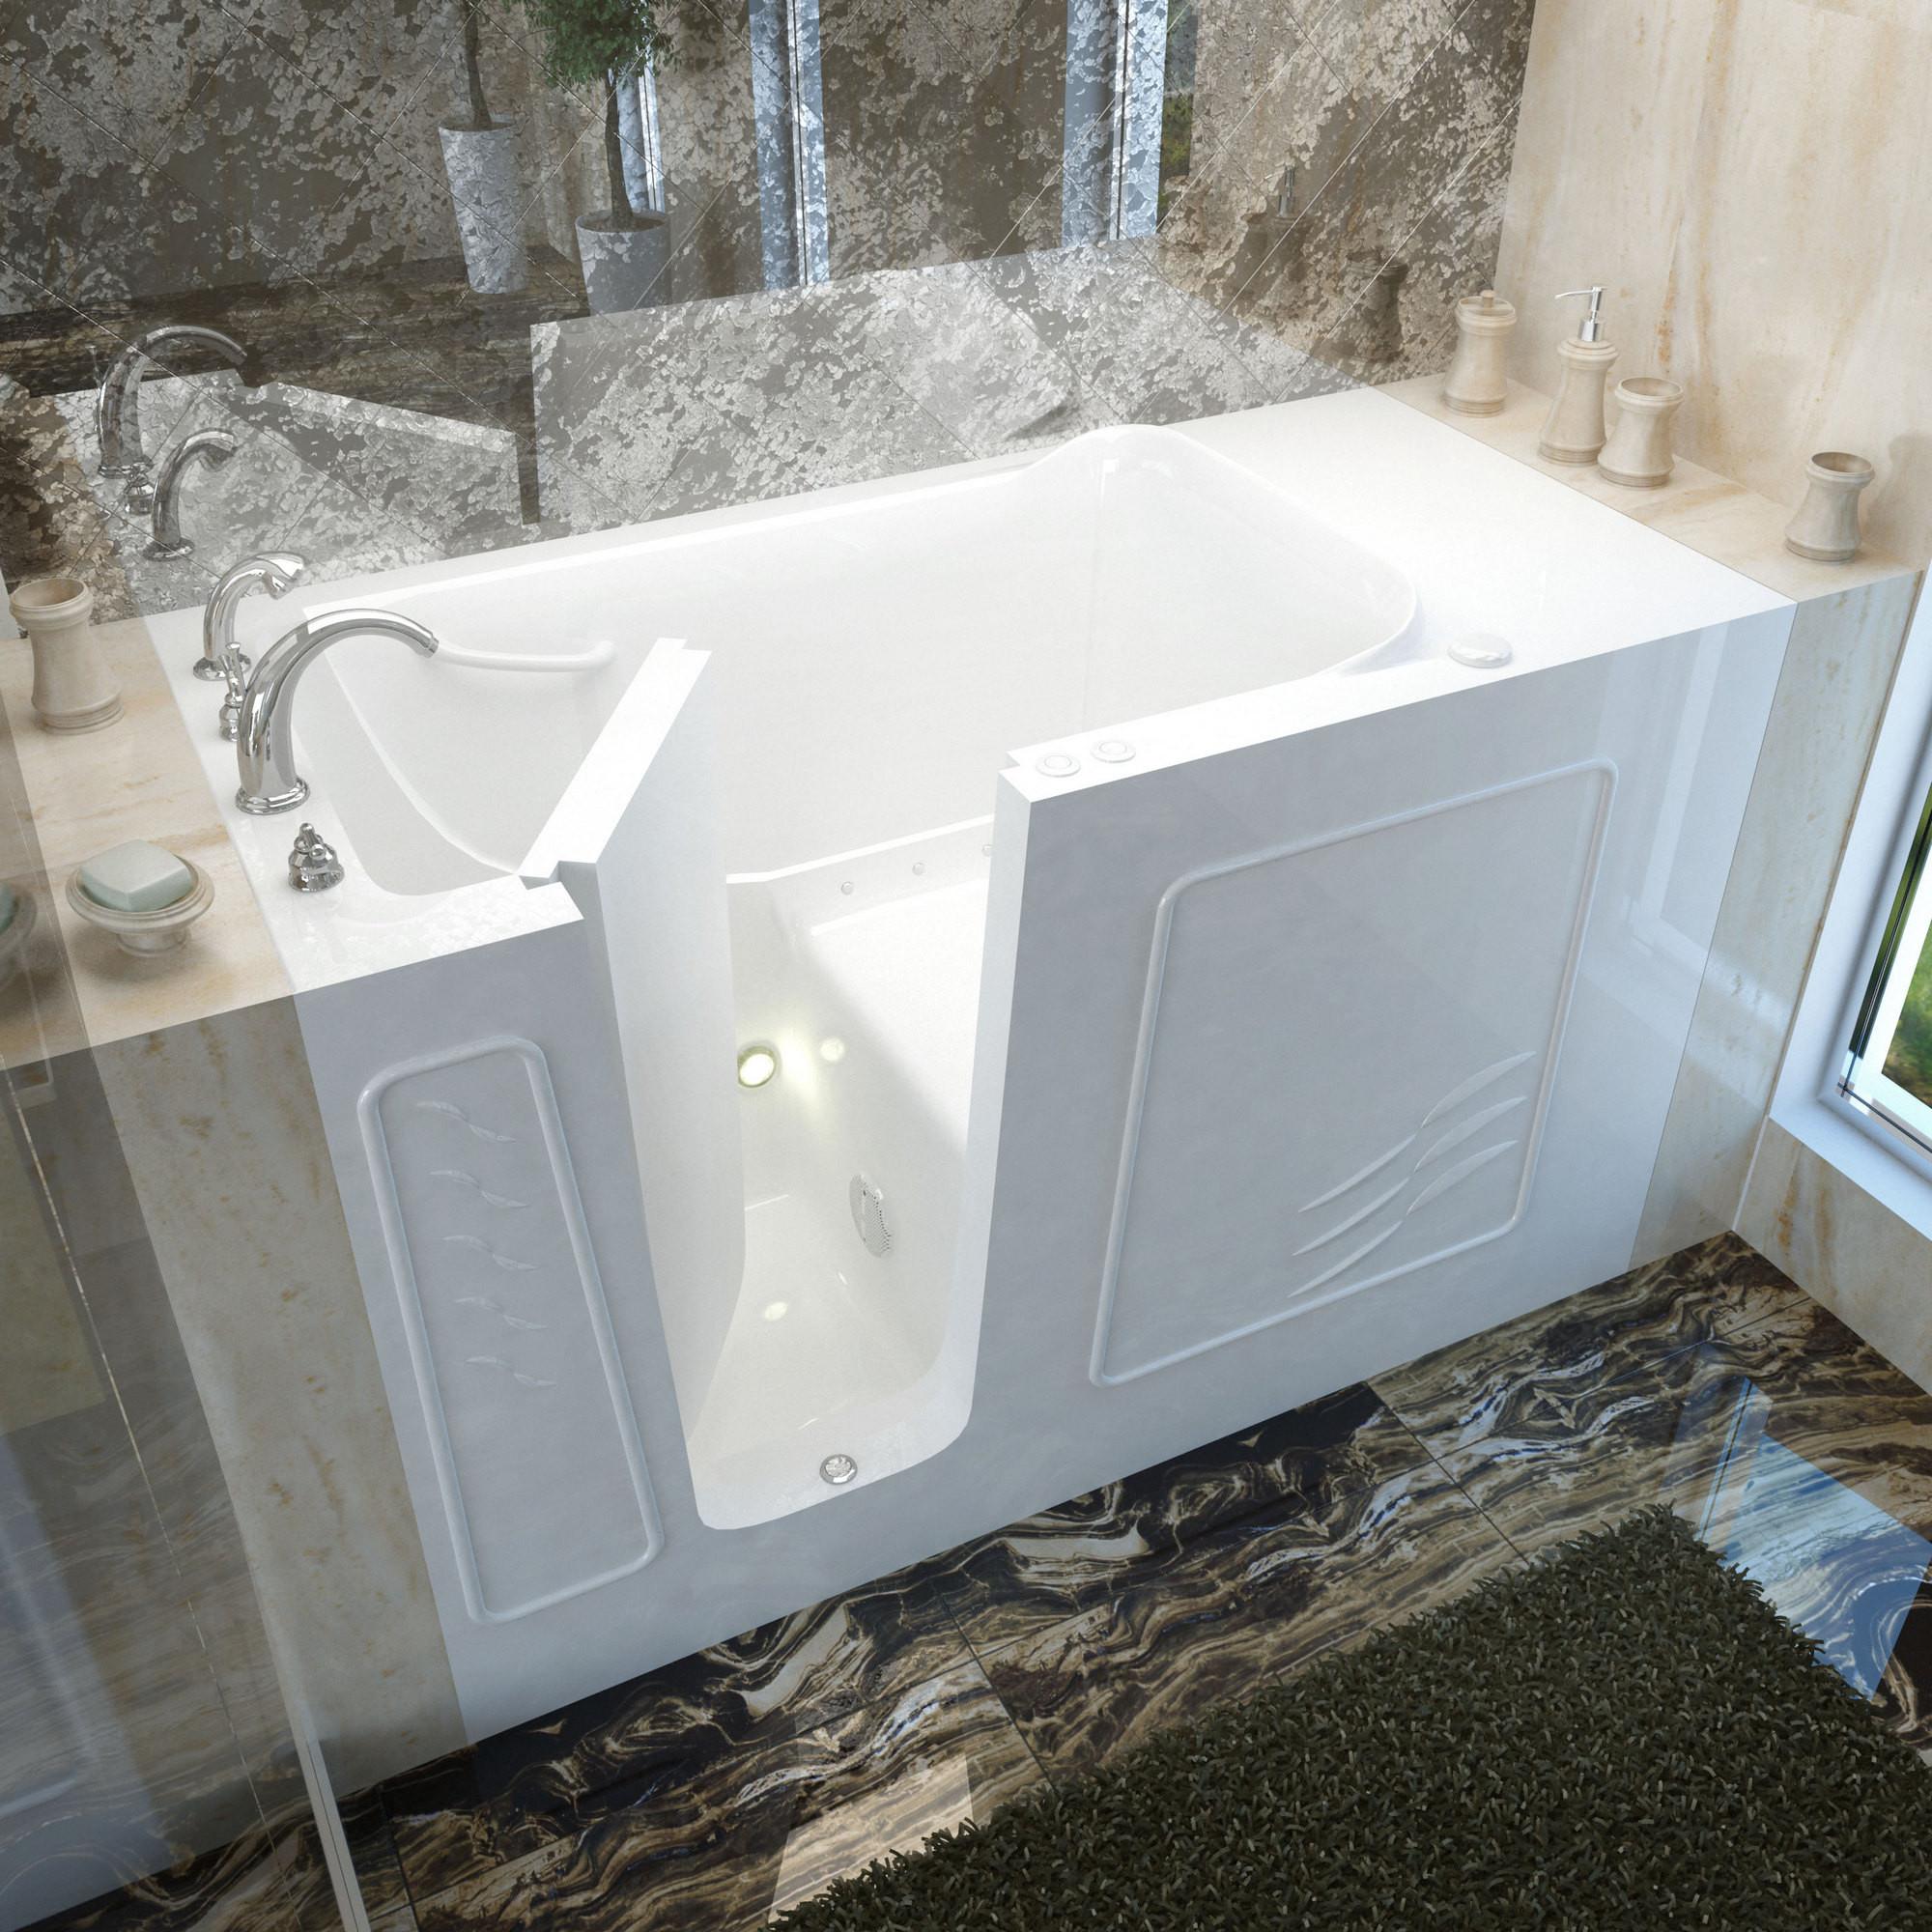 MediTub 3060WILWA Walk-In 30 x 60 Left Drain White Air Jetted Bathtub